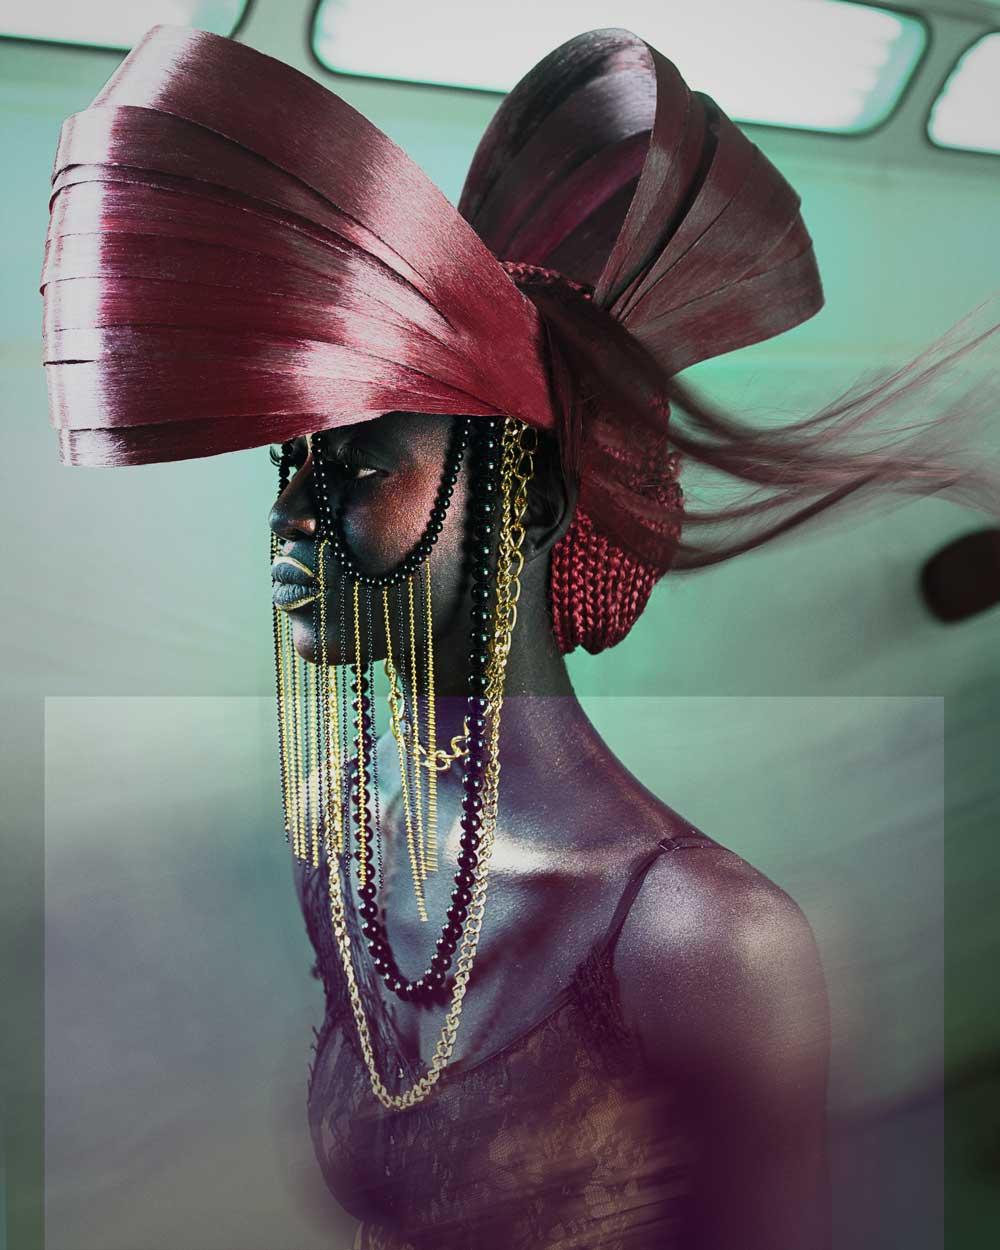 ebony-collection-christian-vendrell-identity-peluqueros-3